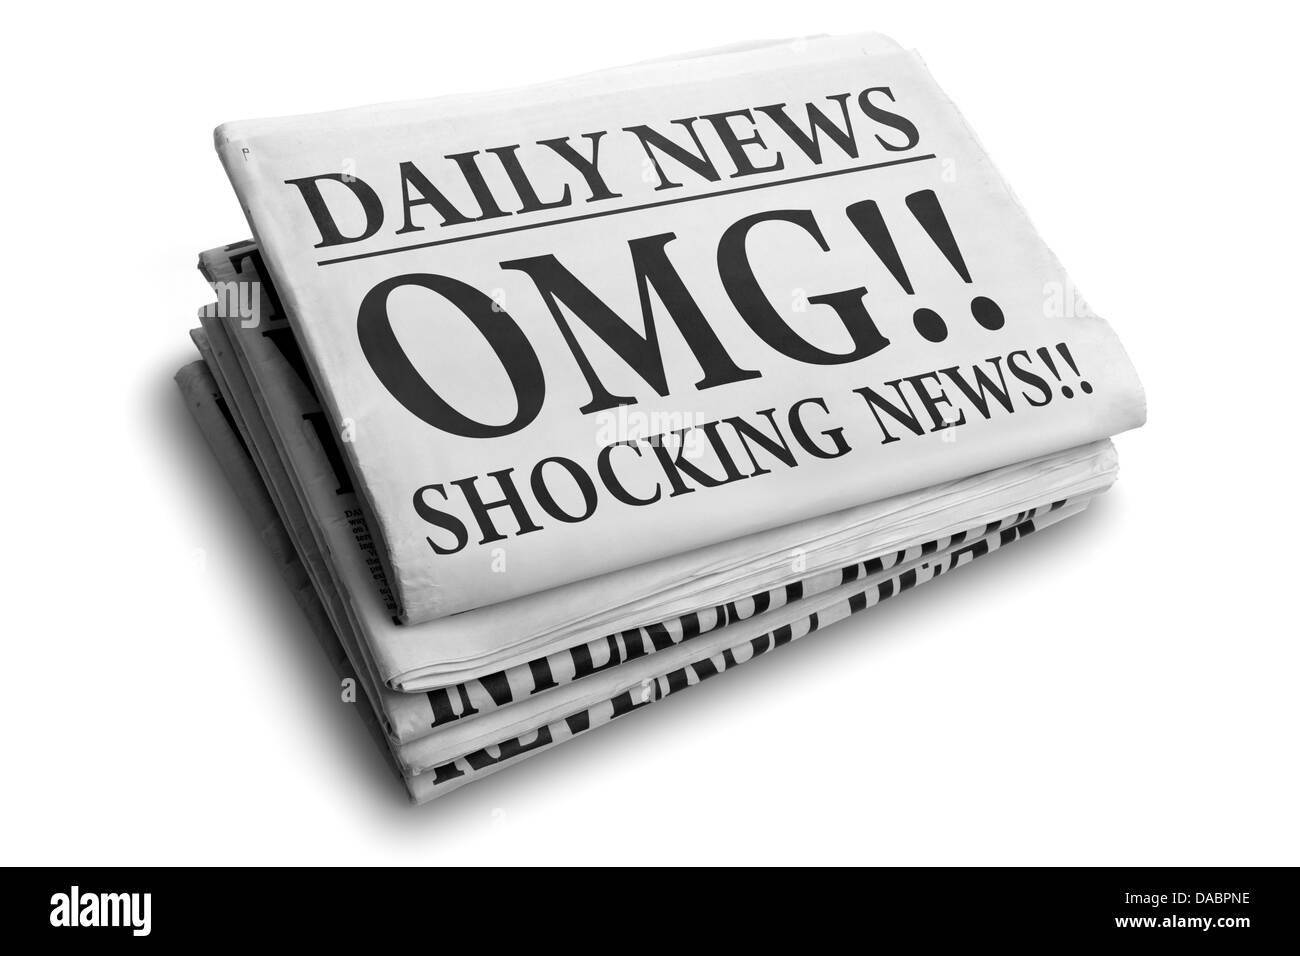 OMG shocking news daily newspaper headline - Stock Image